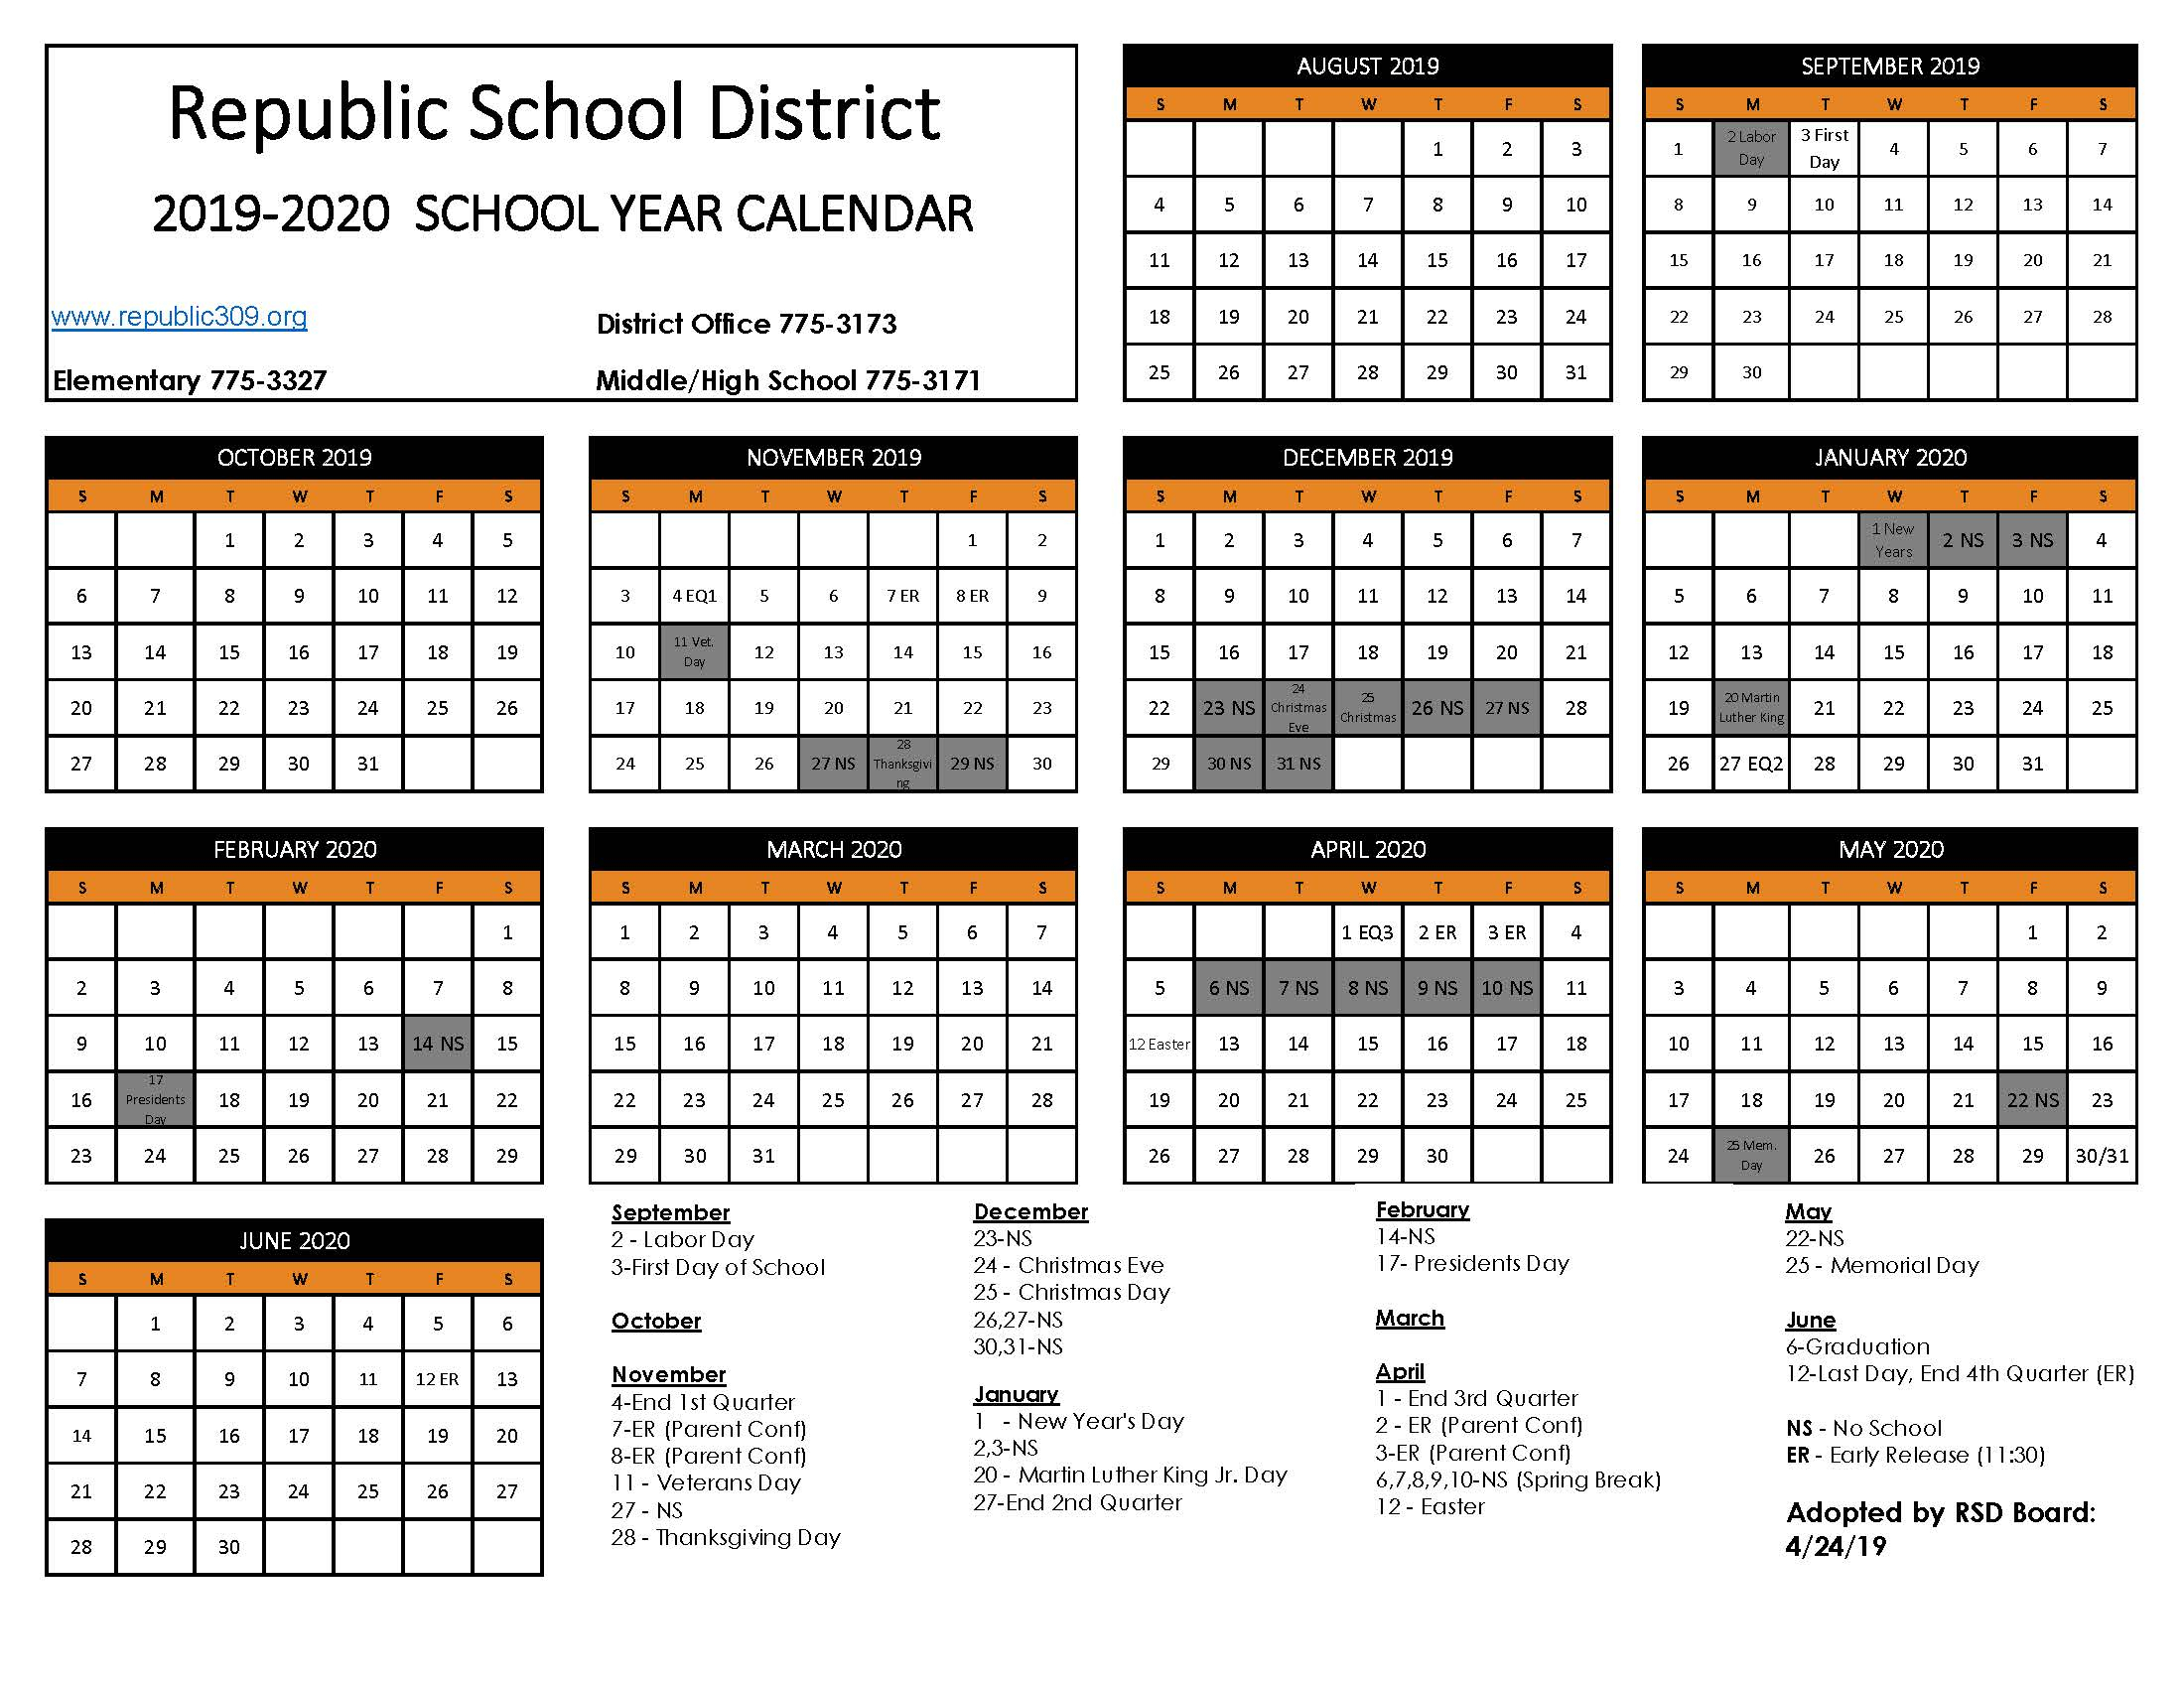 Republic School District Calendar 2020 Publicholidays